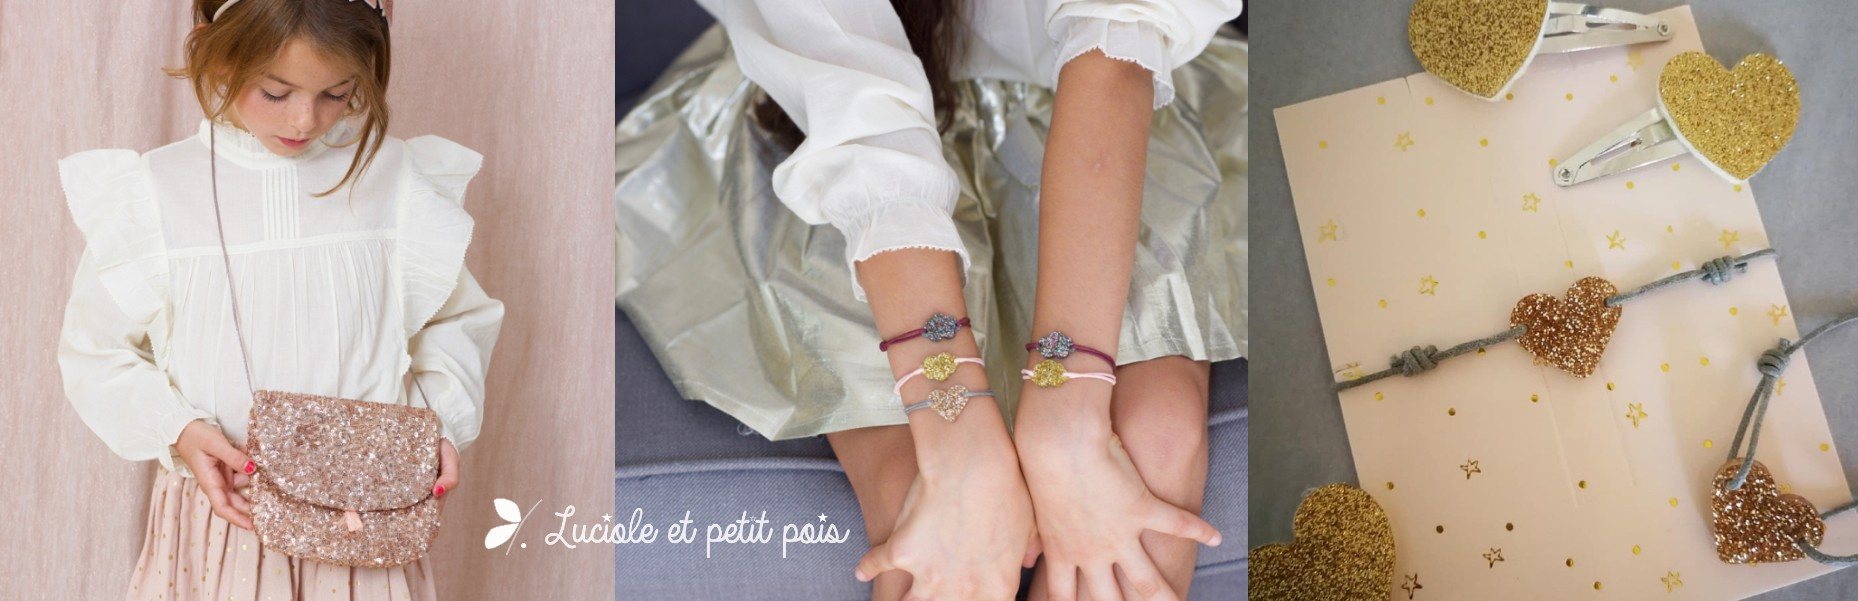 luciole_et_petits_pois_javotine.jpg